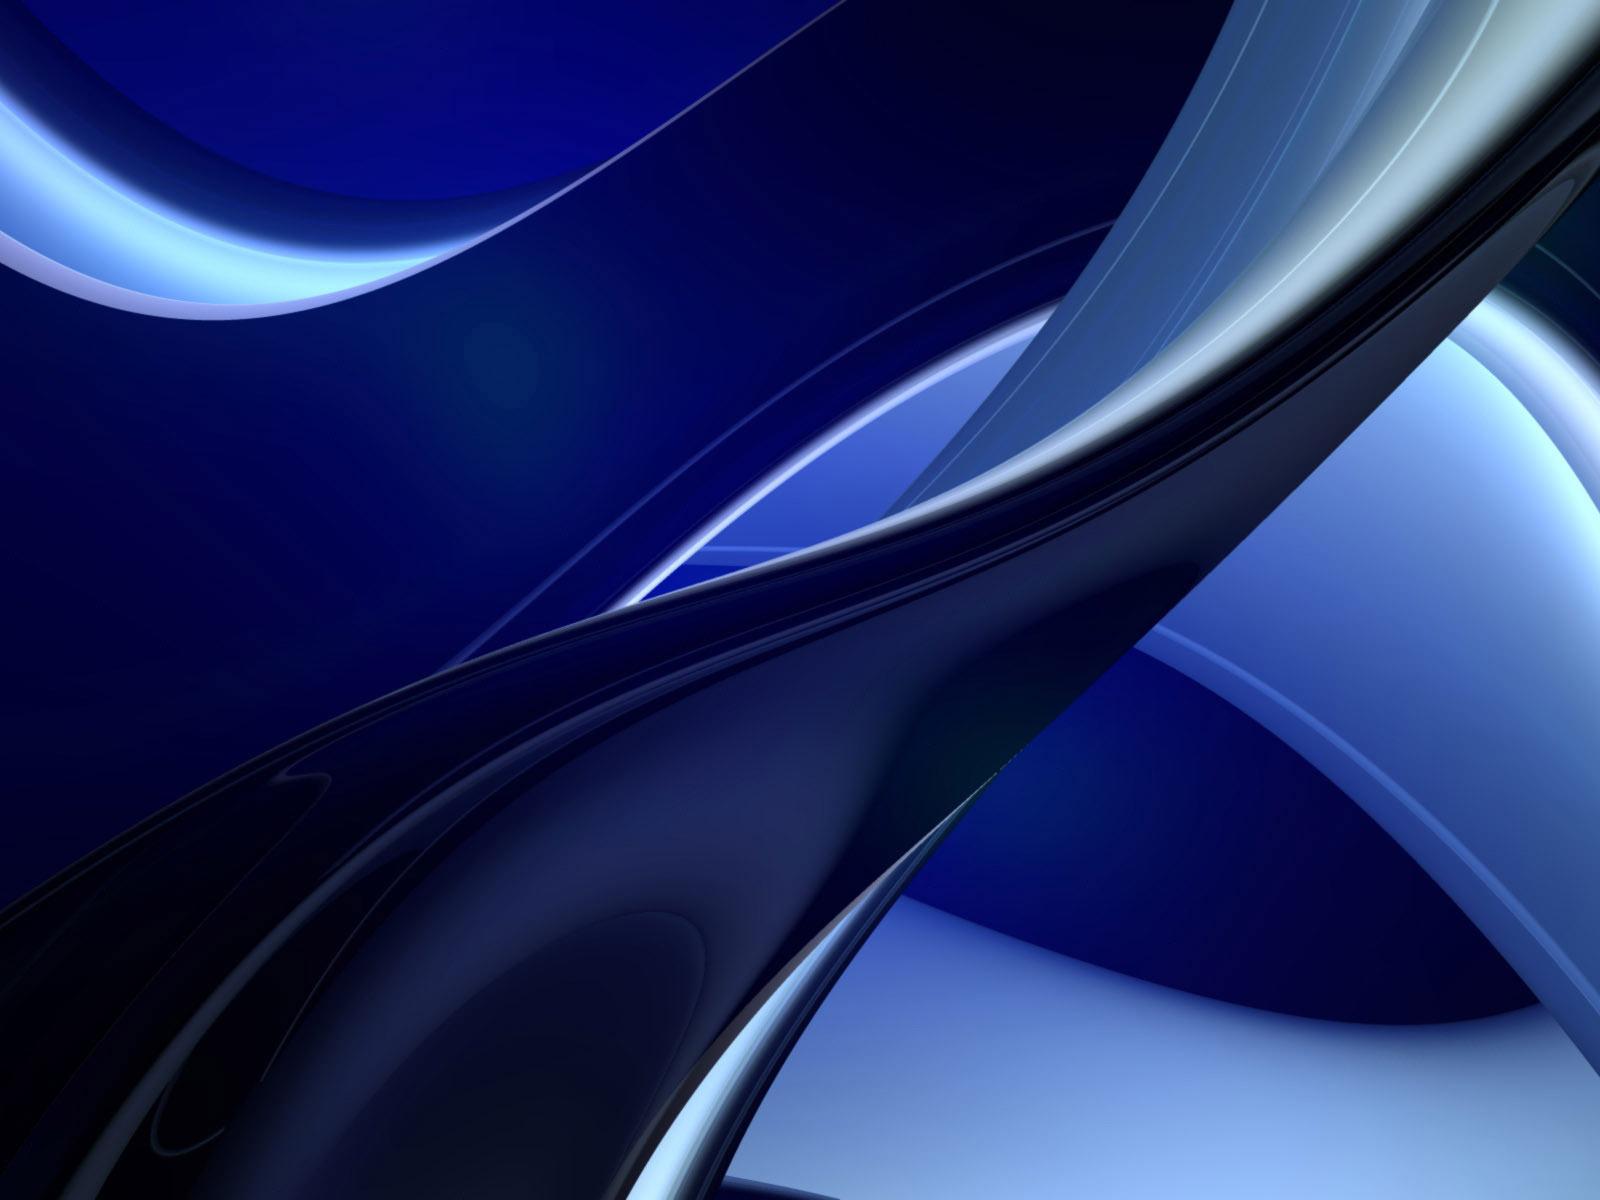 blue desktop wallpaper blue desktop wallpaper blue desktop wallpaper 1600x1200